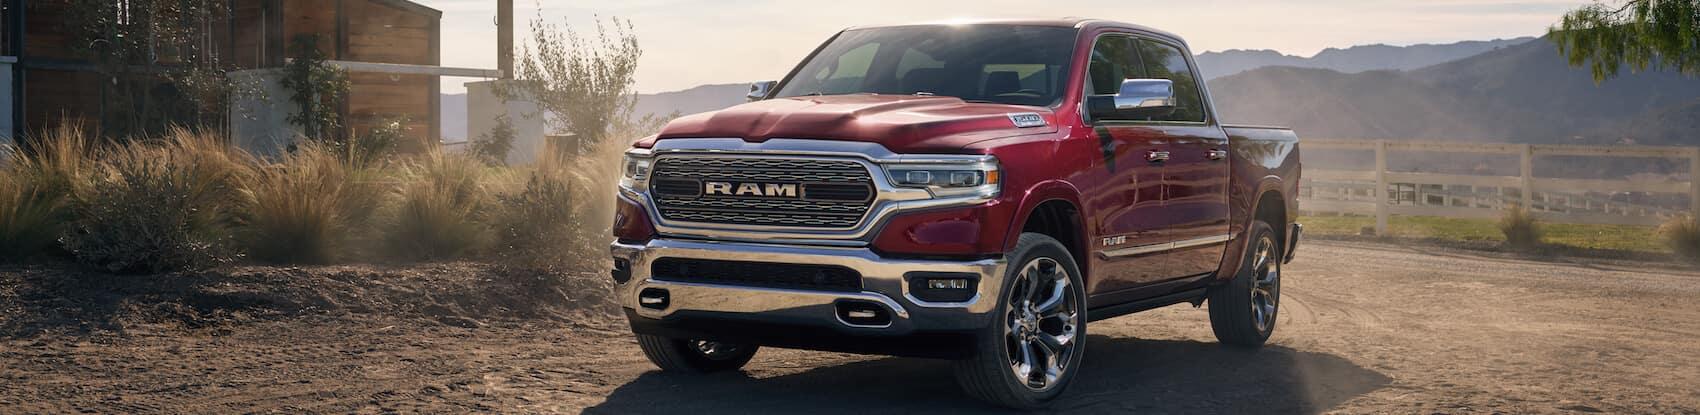 2019 Ram 1500 red Rockwall, TX